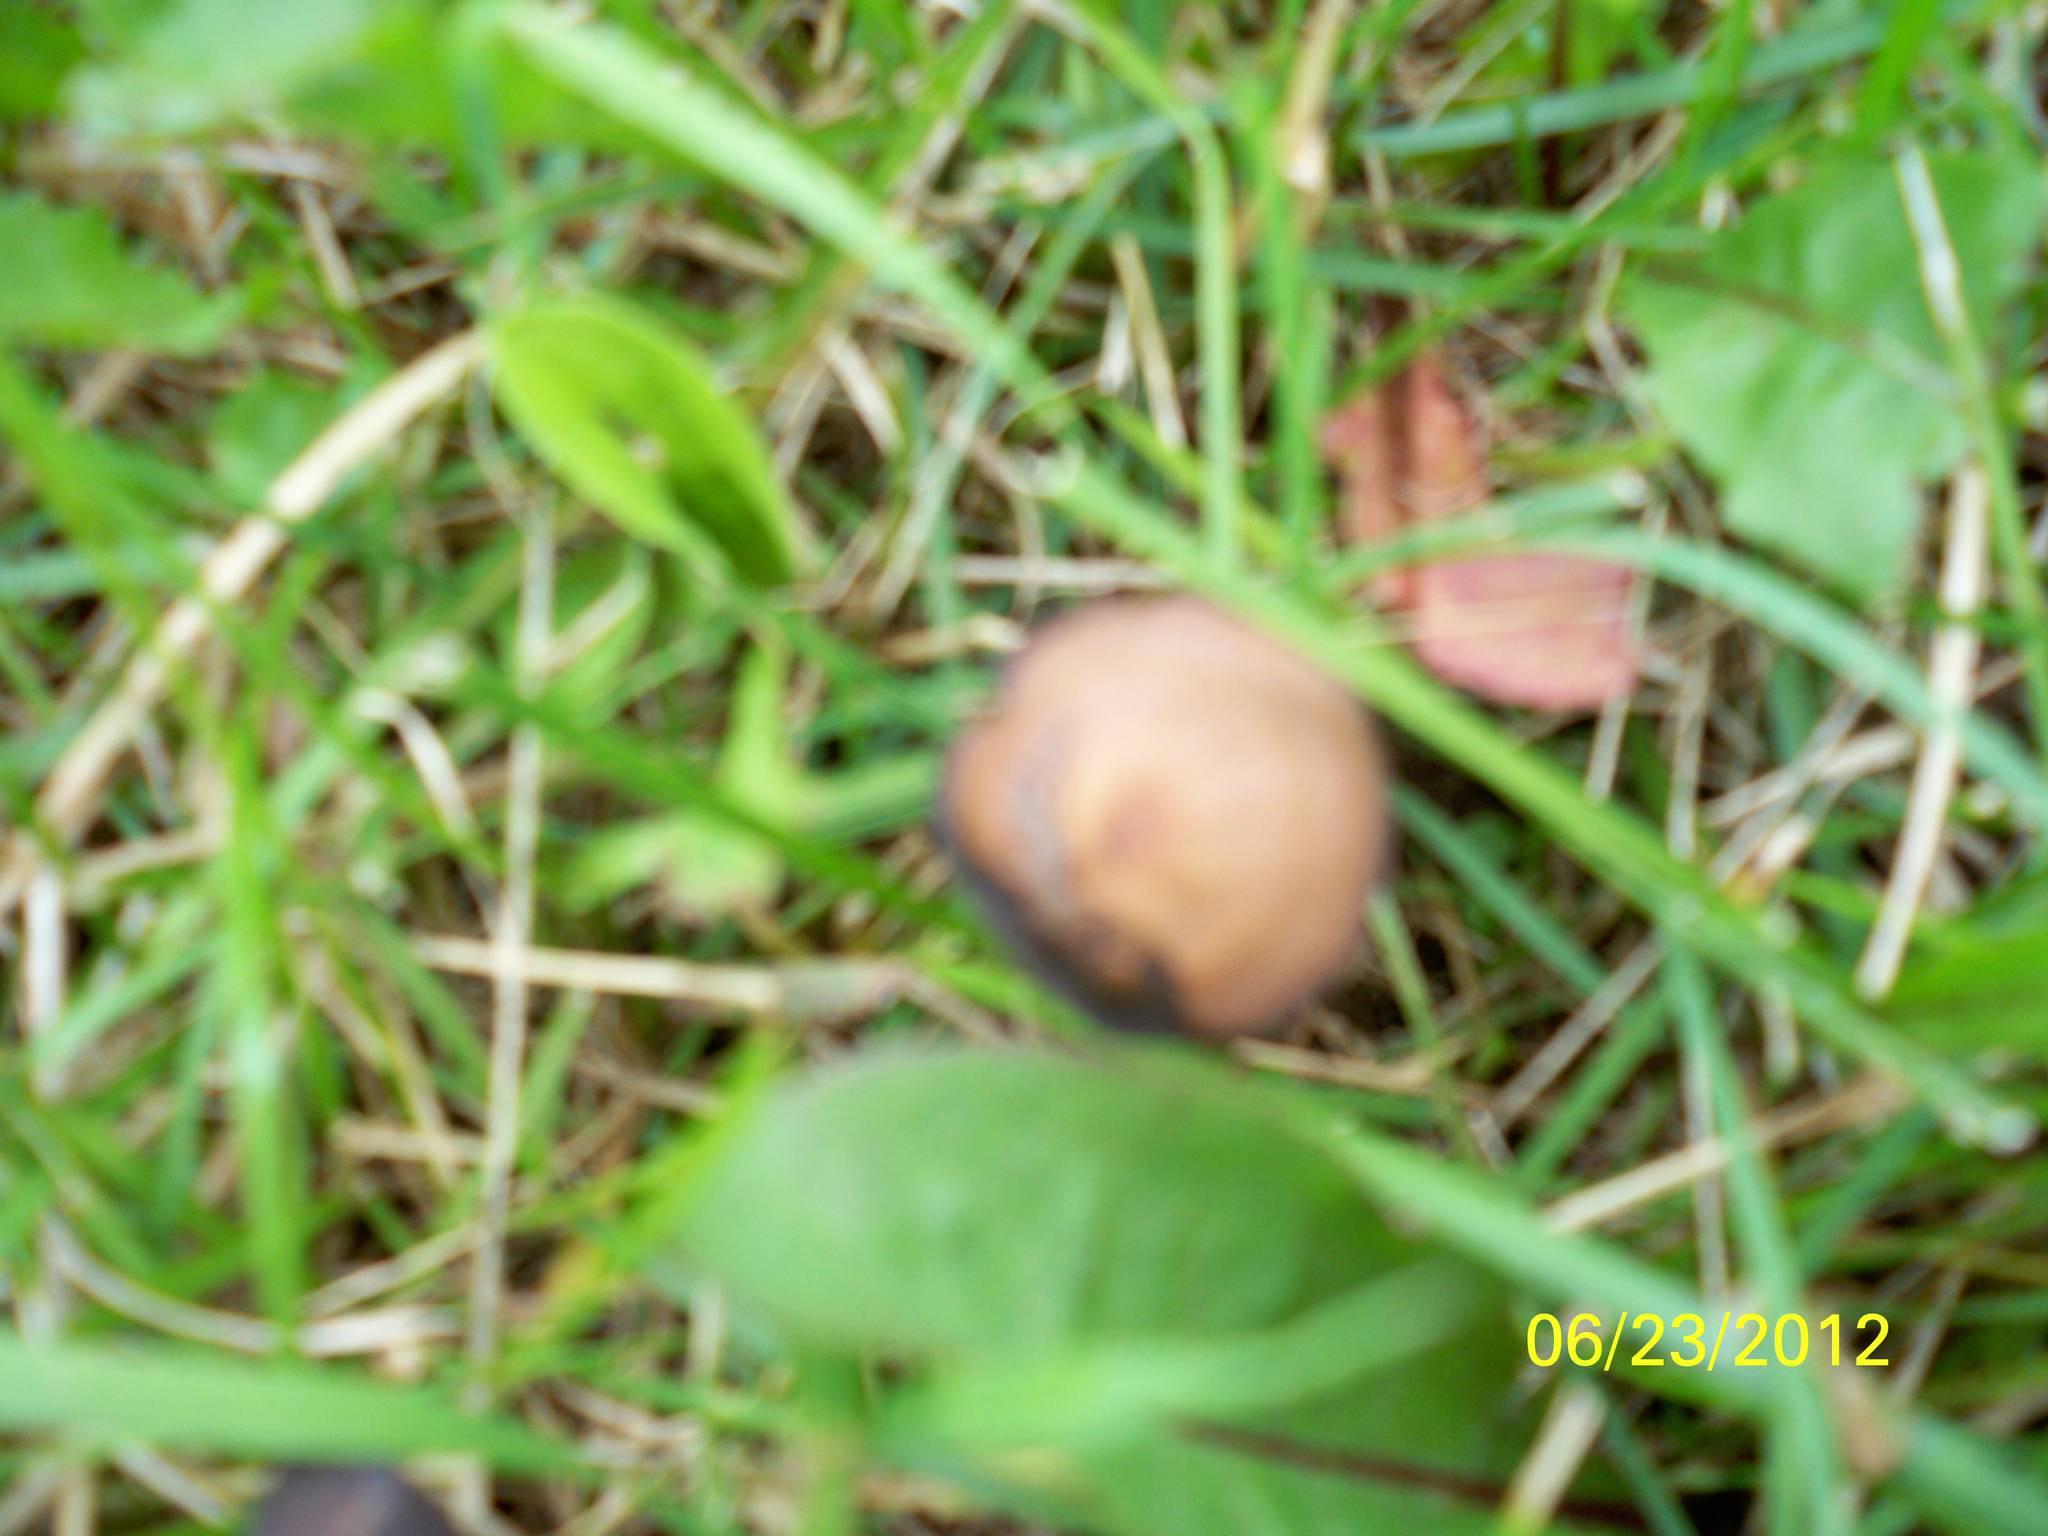 Mushroom ID Wisconsin - Mushroom Hunting and Identification